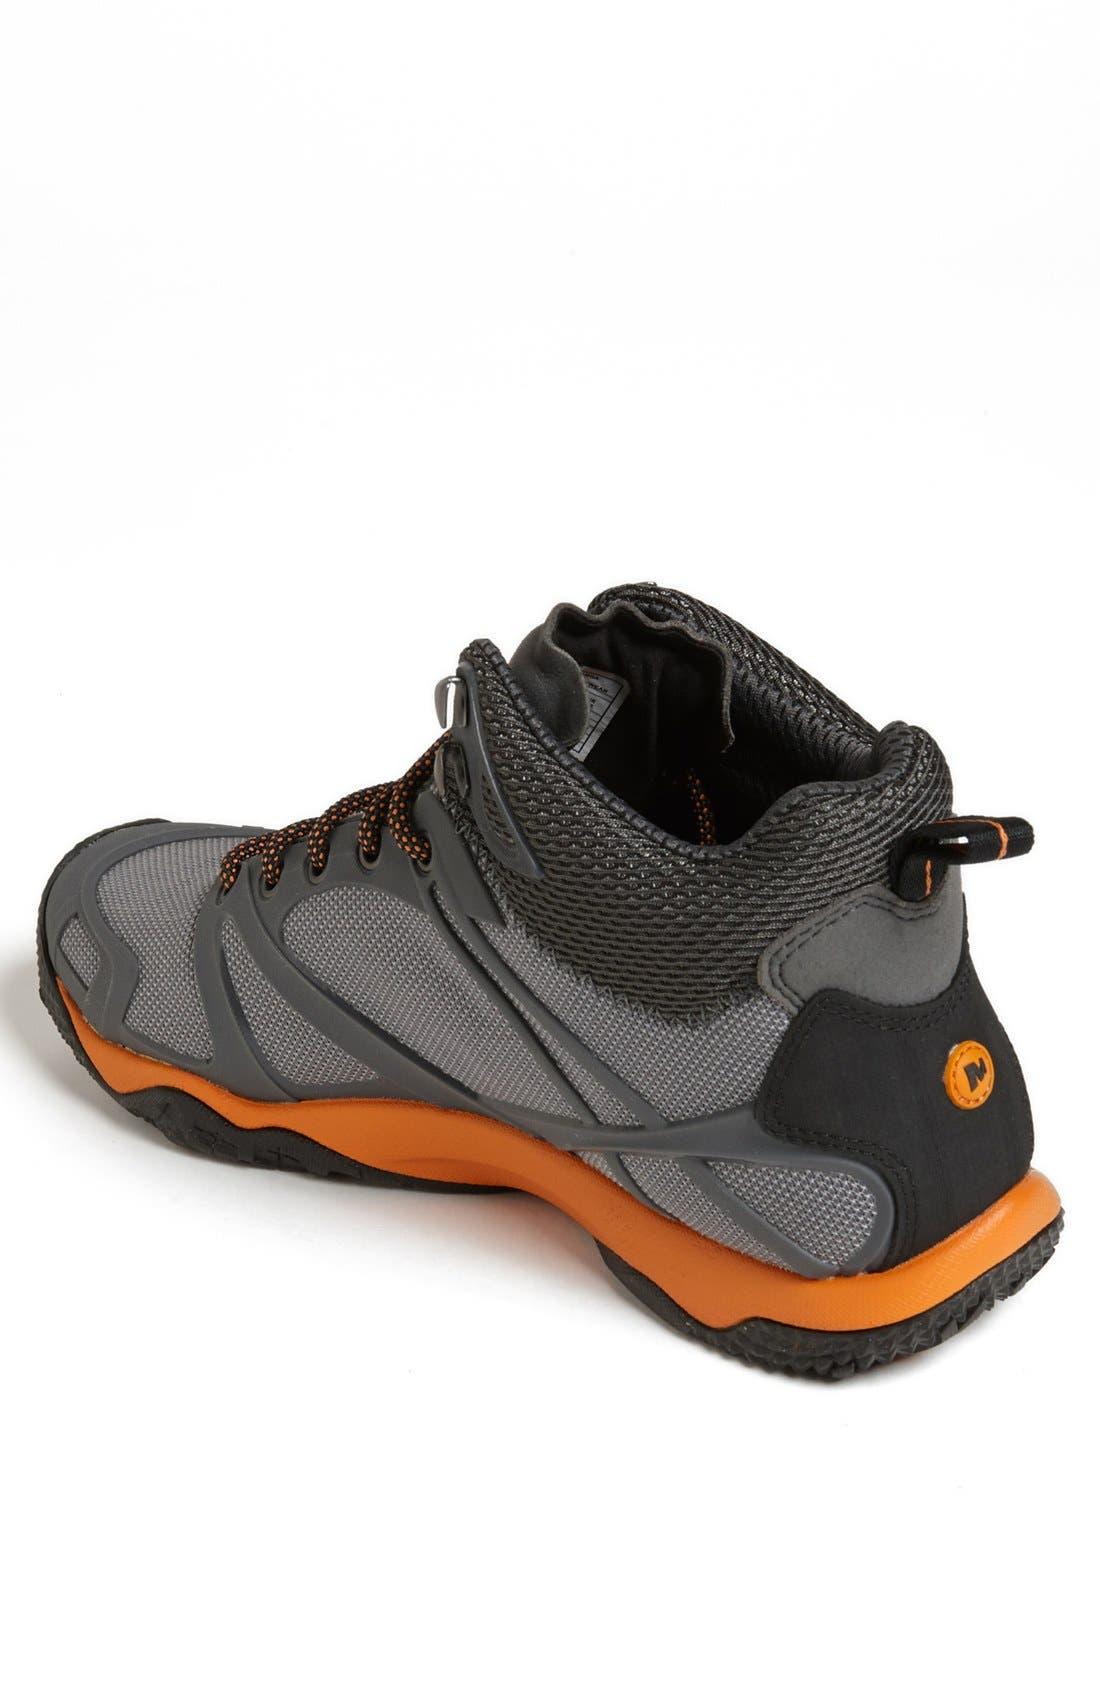 Alternate Image 2  - Merrell 'Proterra Mid Sport' Waterproof Hiking Boot (Men)